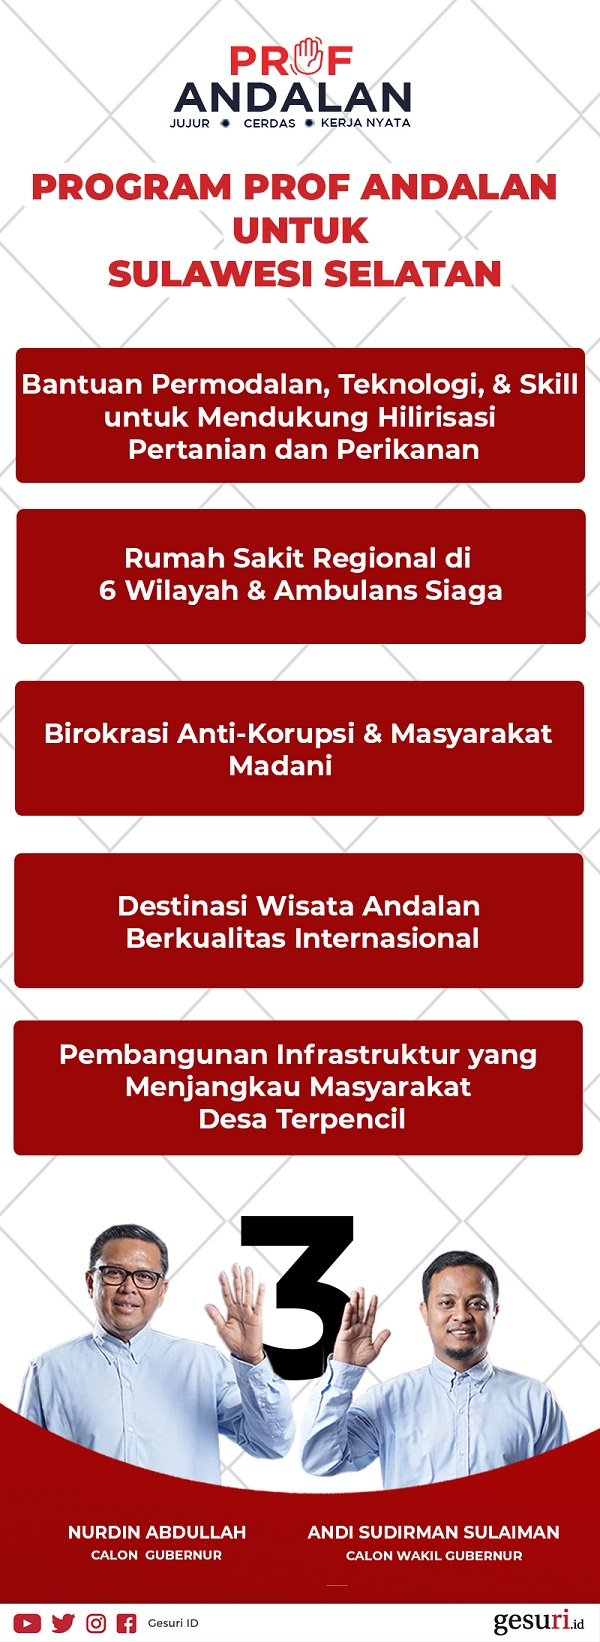 Program Andalan dari Prof Andalan untuk Sulawesi Selatan